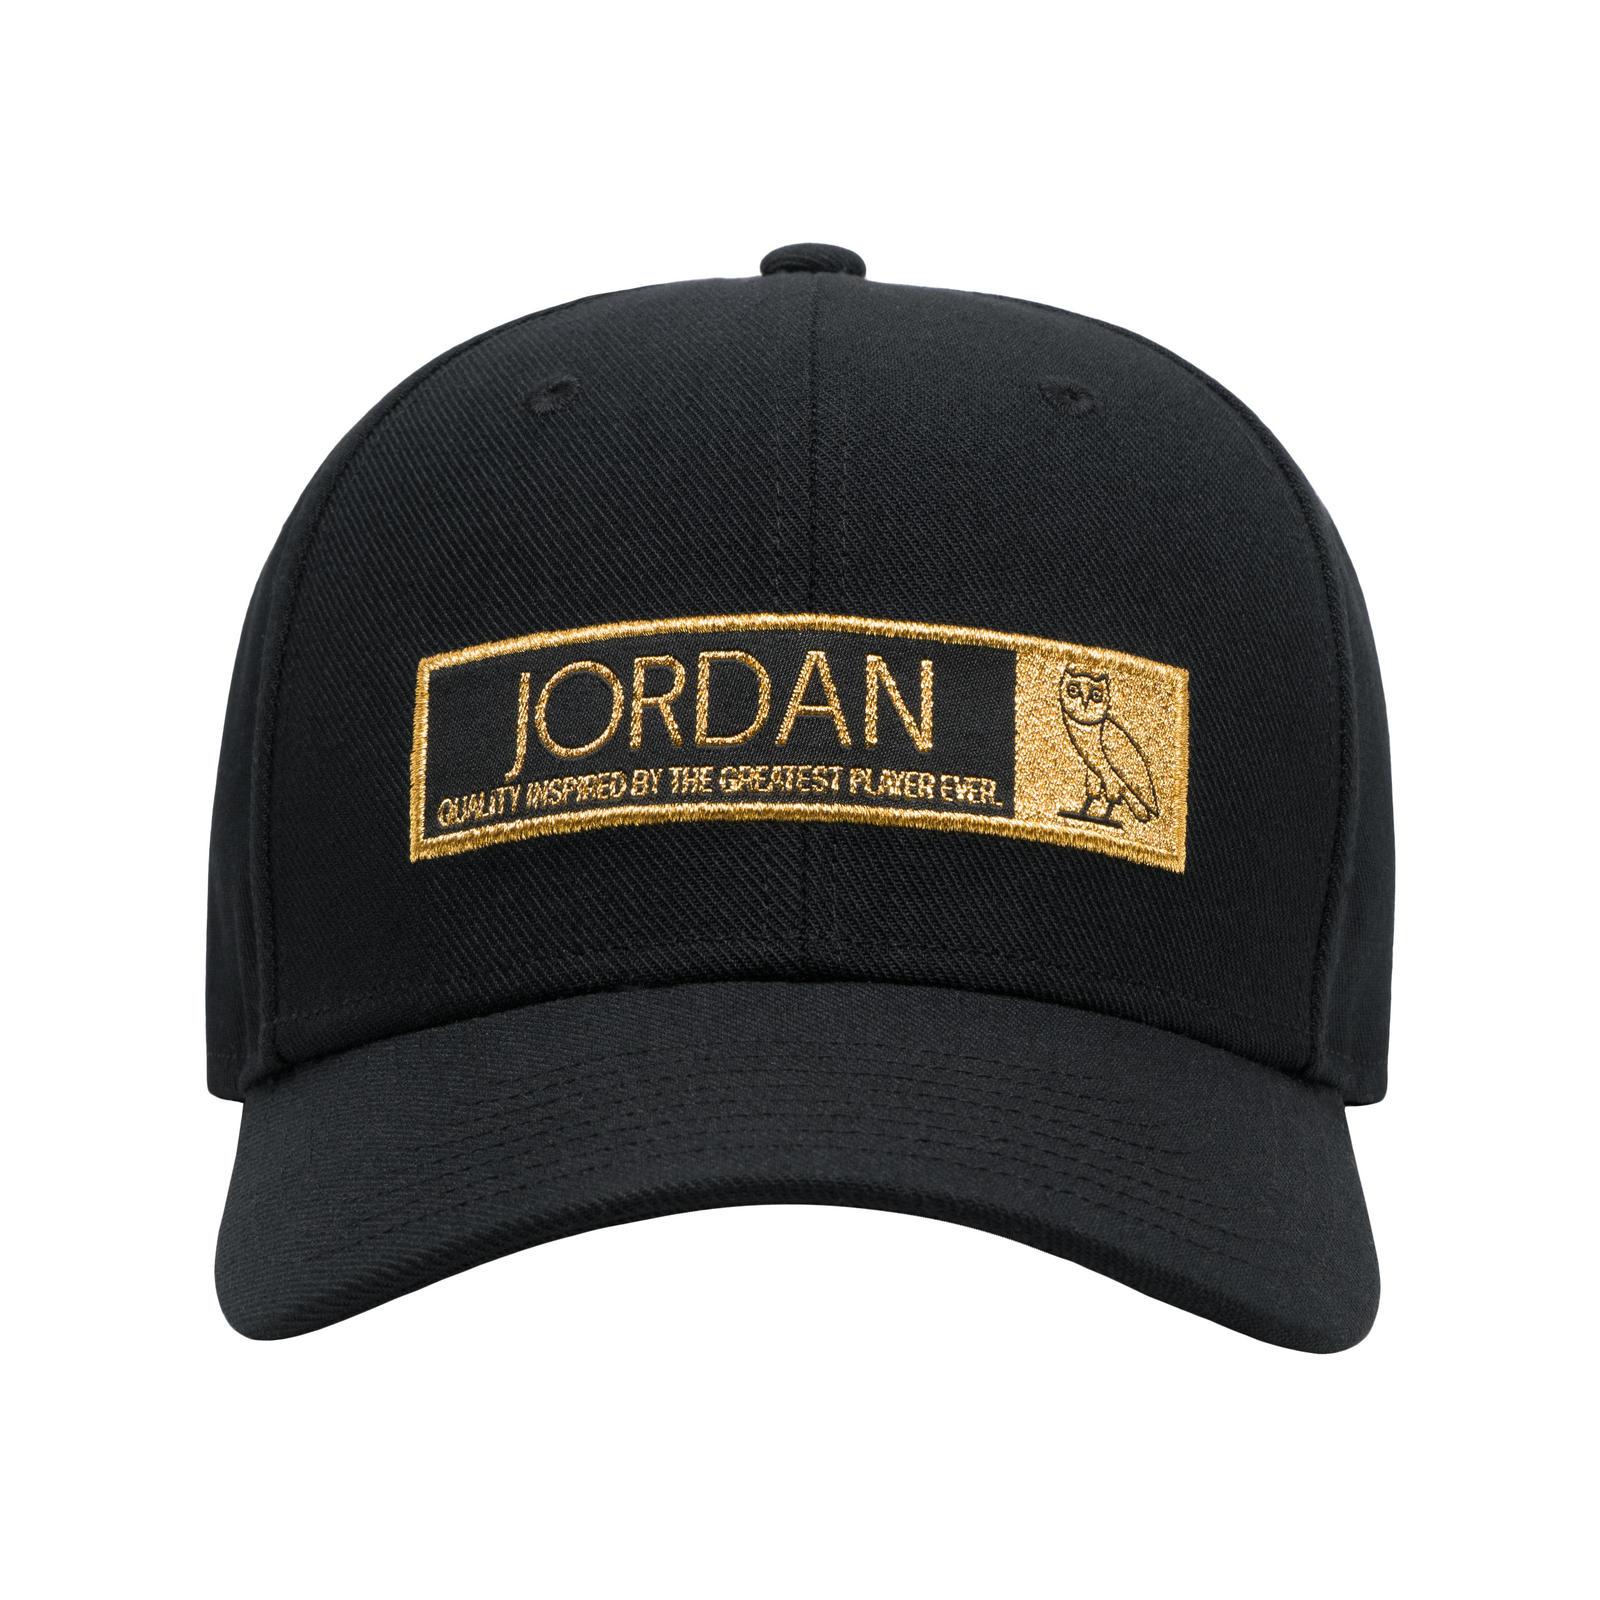 Jordan12%20 Logo%20 Hat%20 Black%20 Front 2